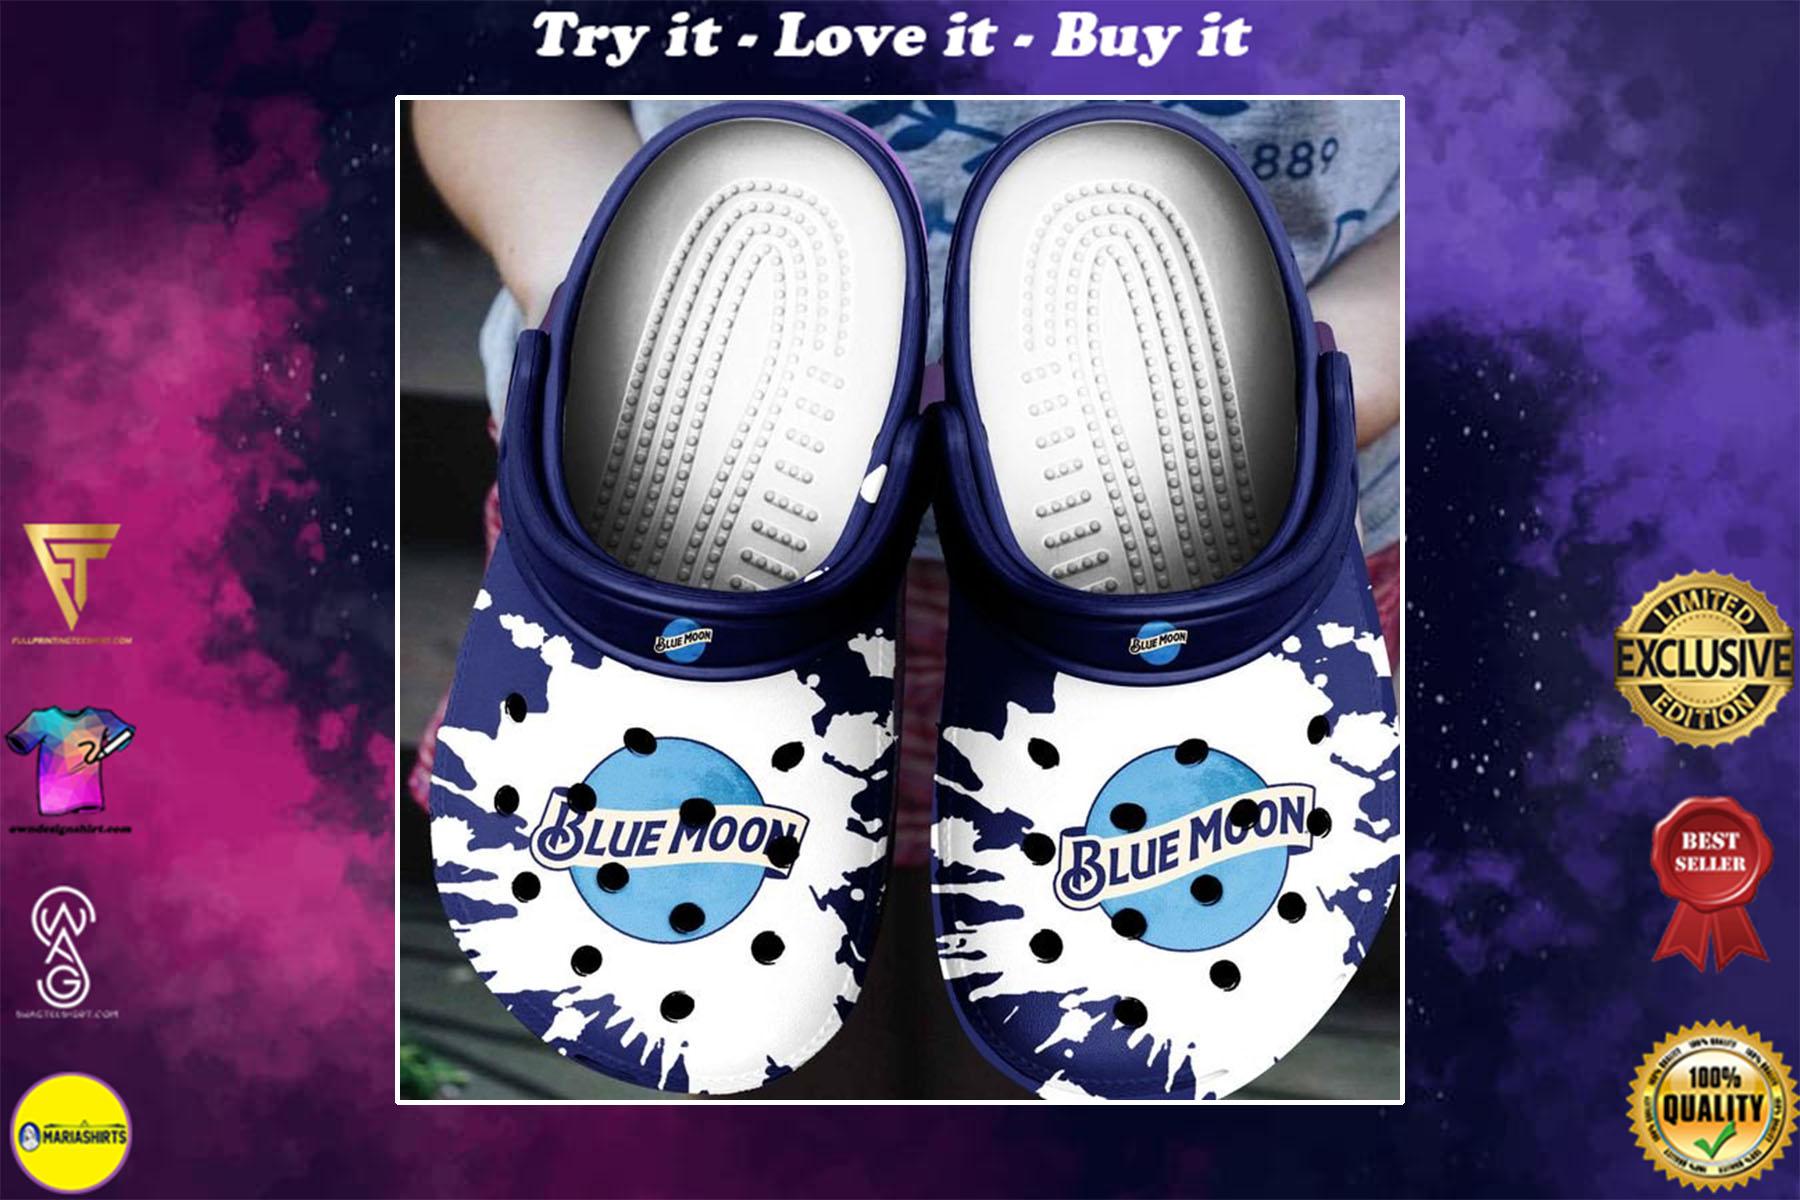 [special edition] blue moon beer crocs shoes - maria